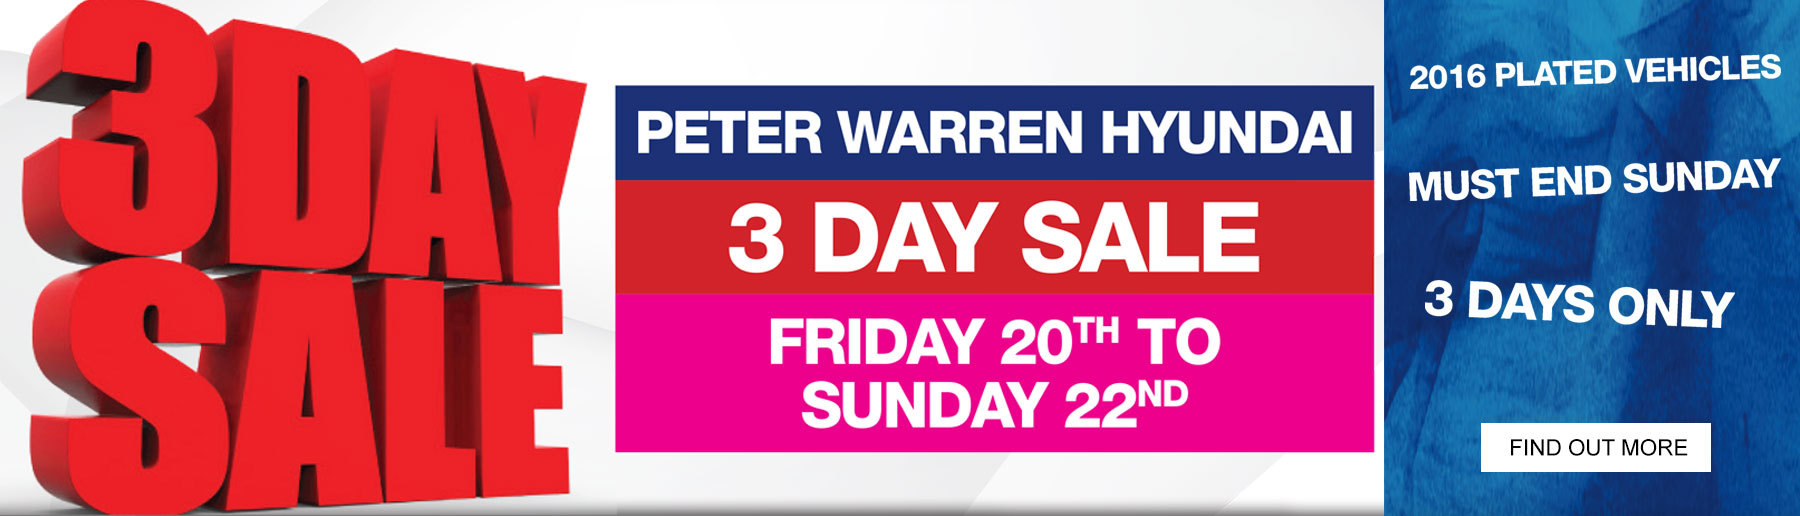 Peter Warren Hyundai 3 Day Sale